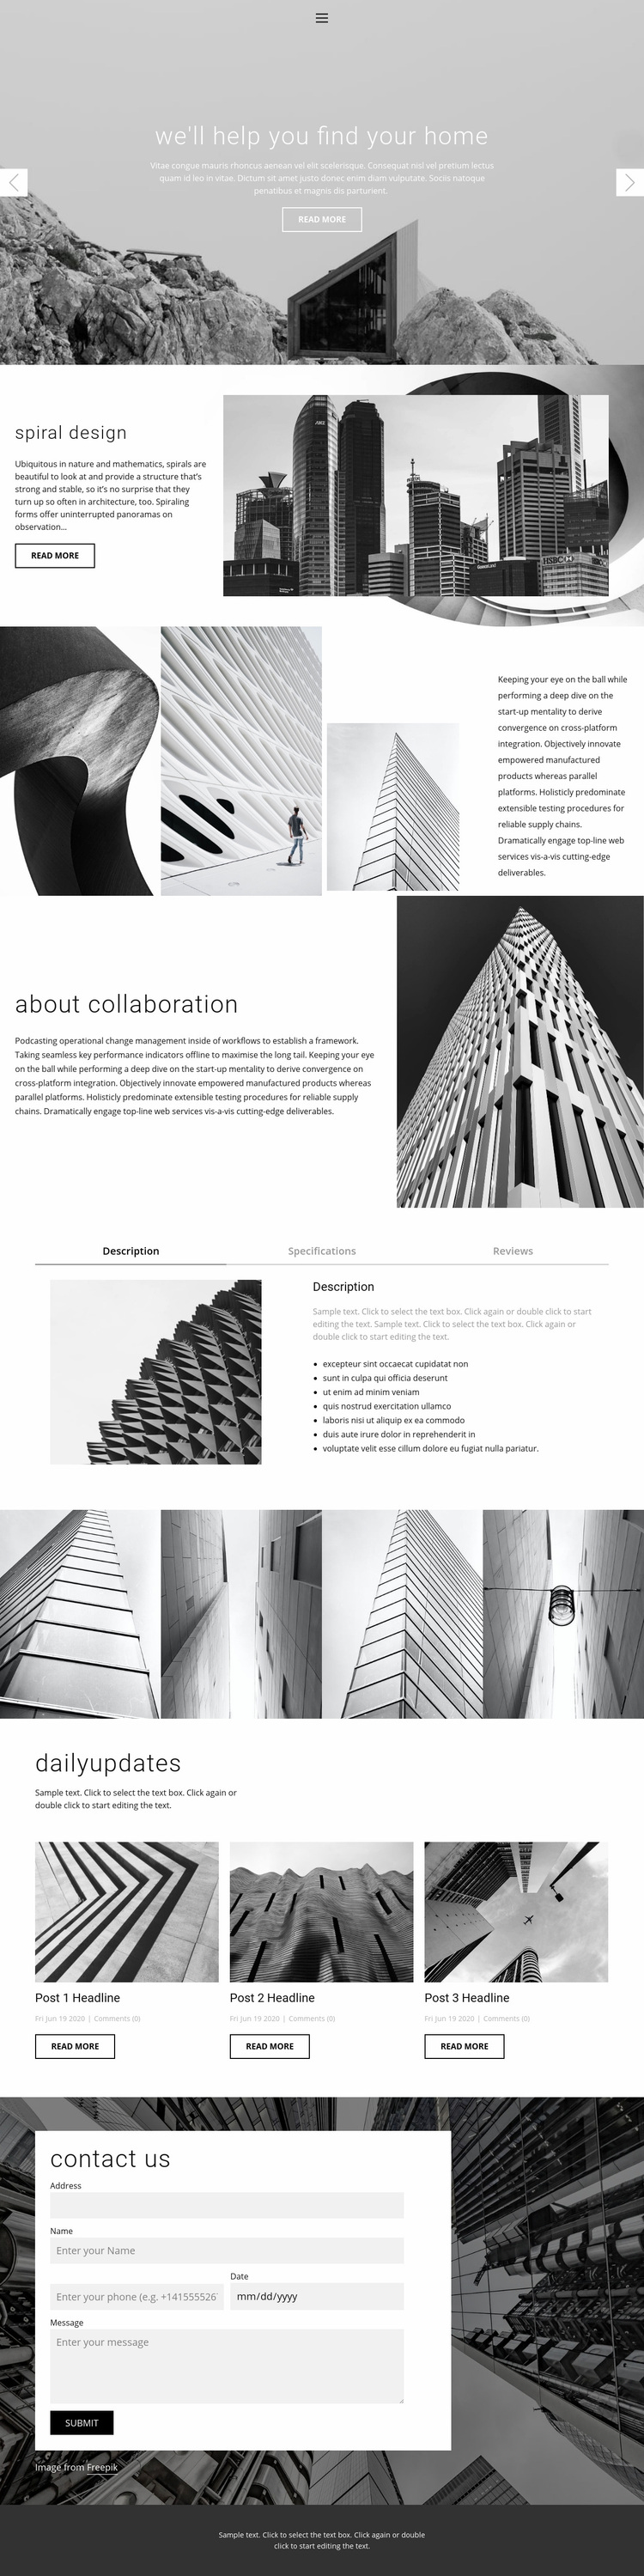 Architecture ideal studio Web Page Designer